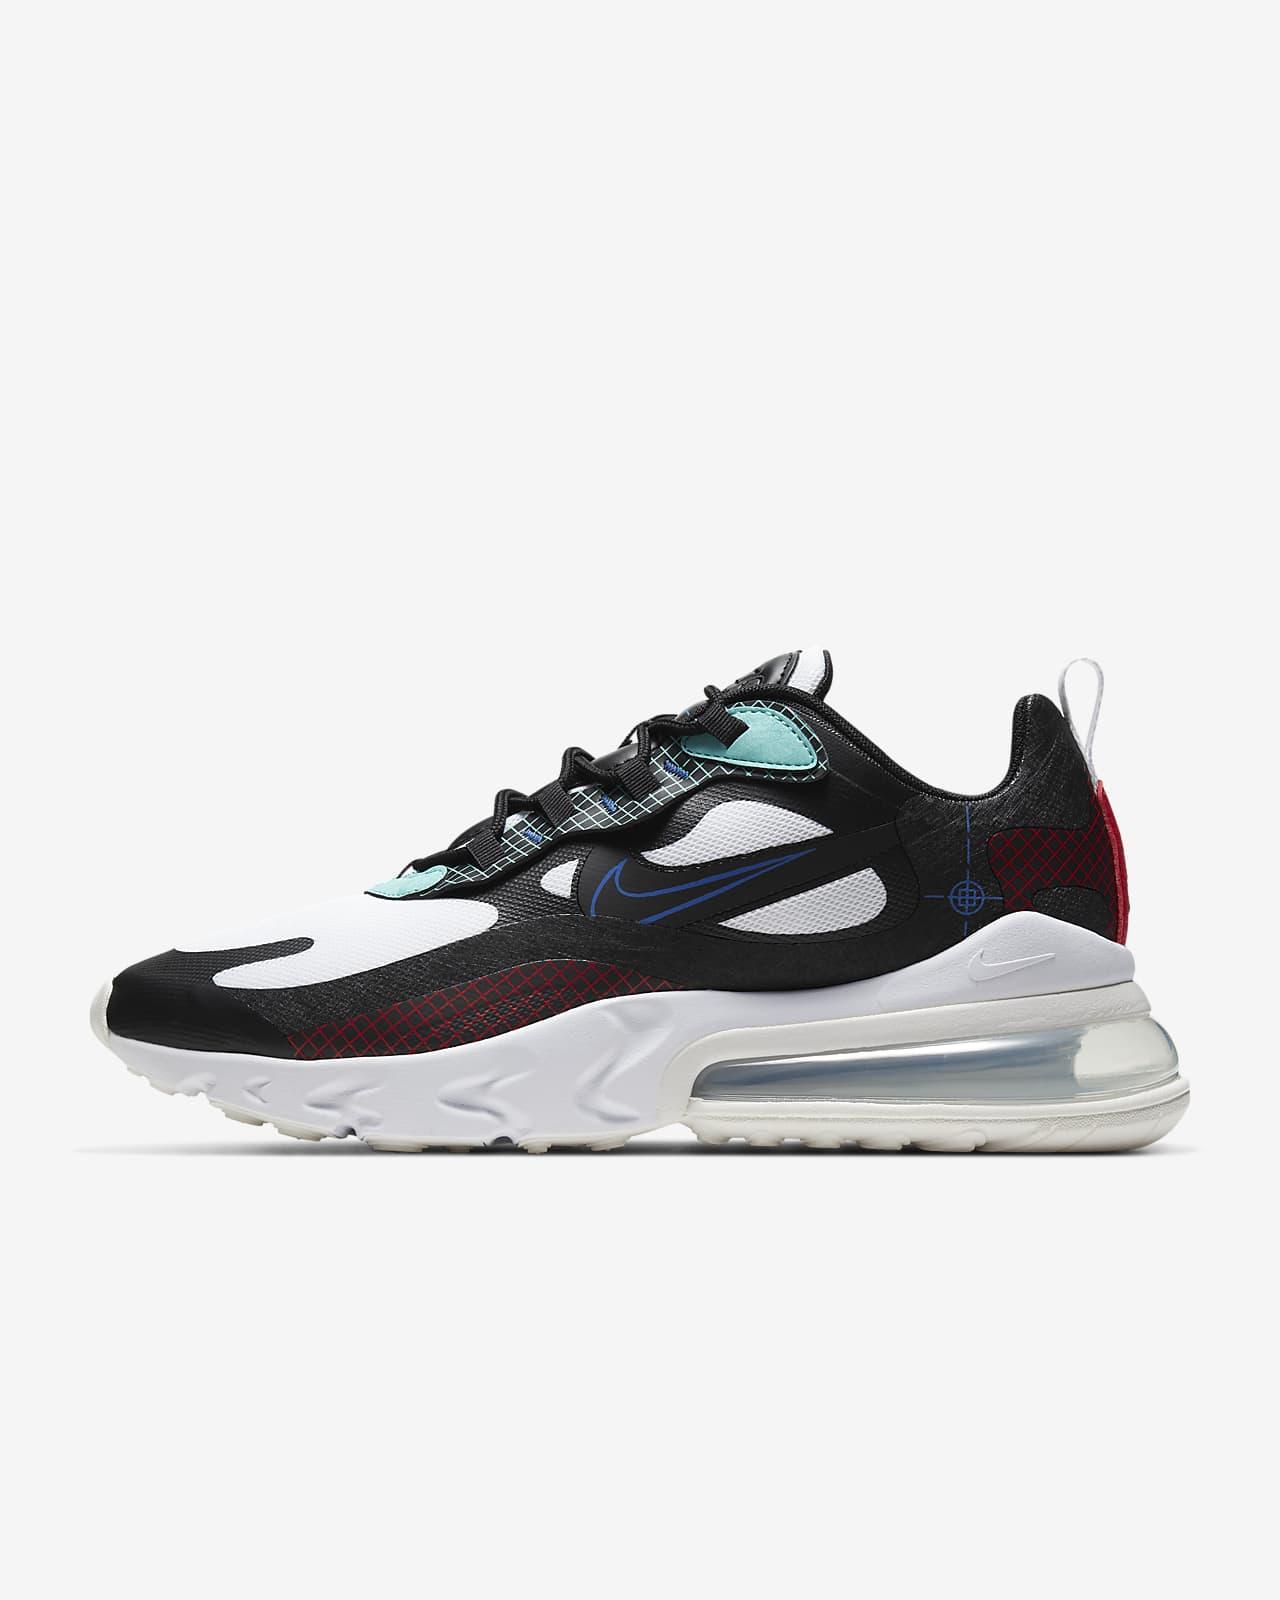 Nike Air Max 270 React Herrenschuh